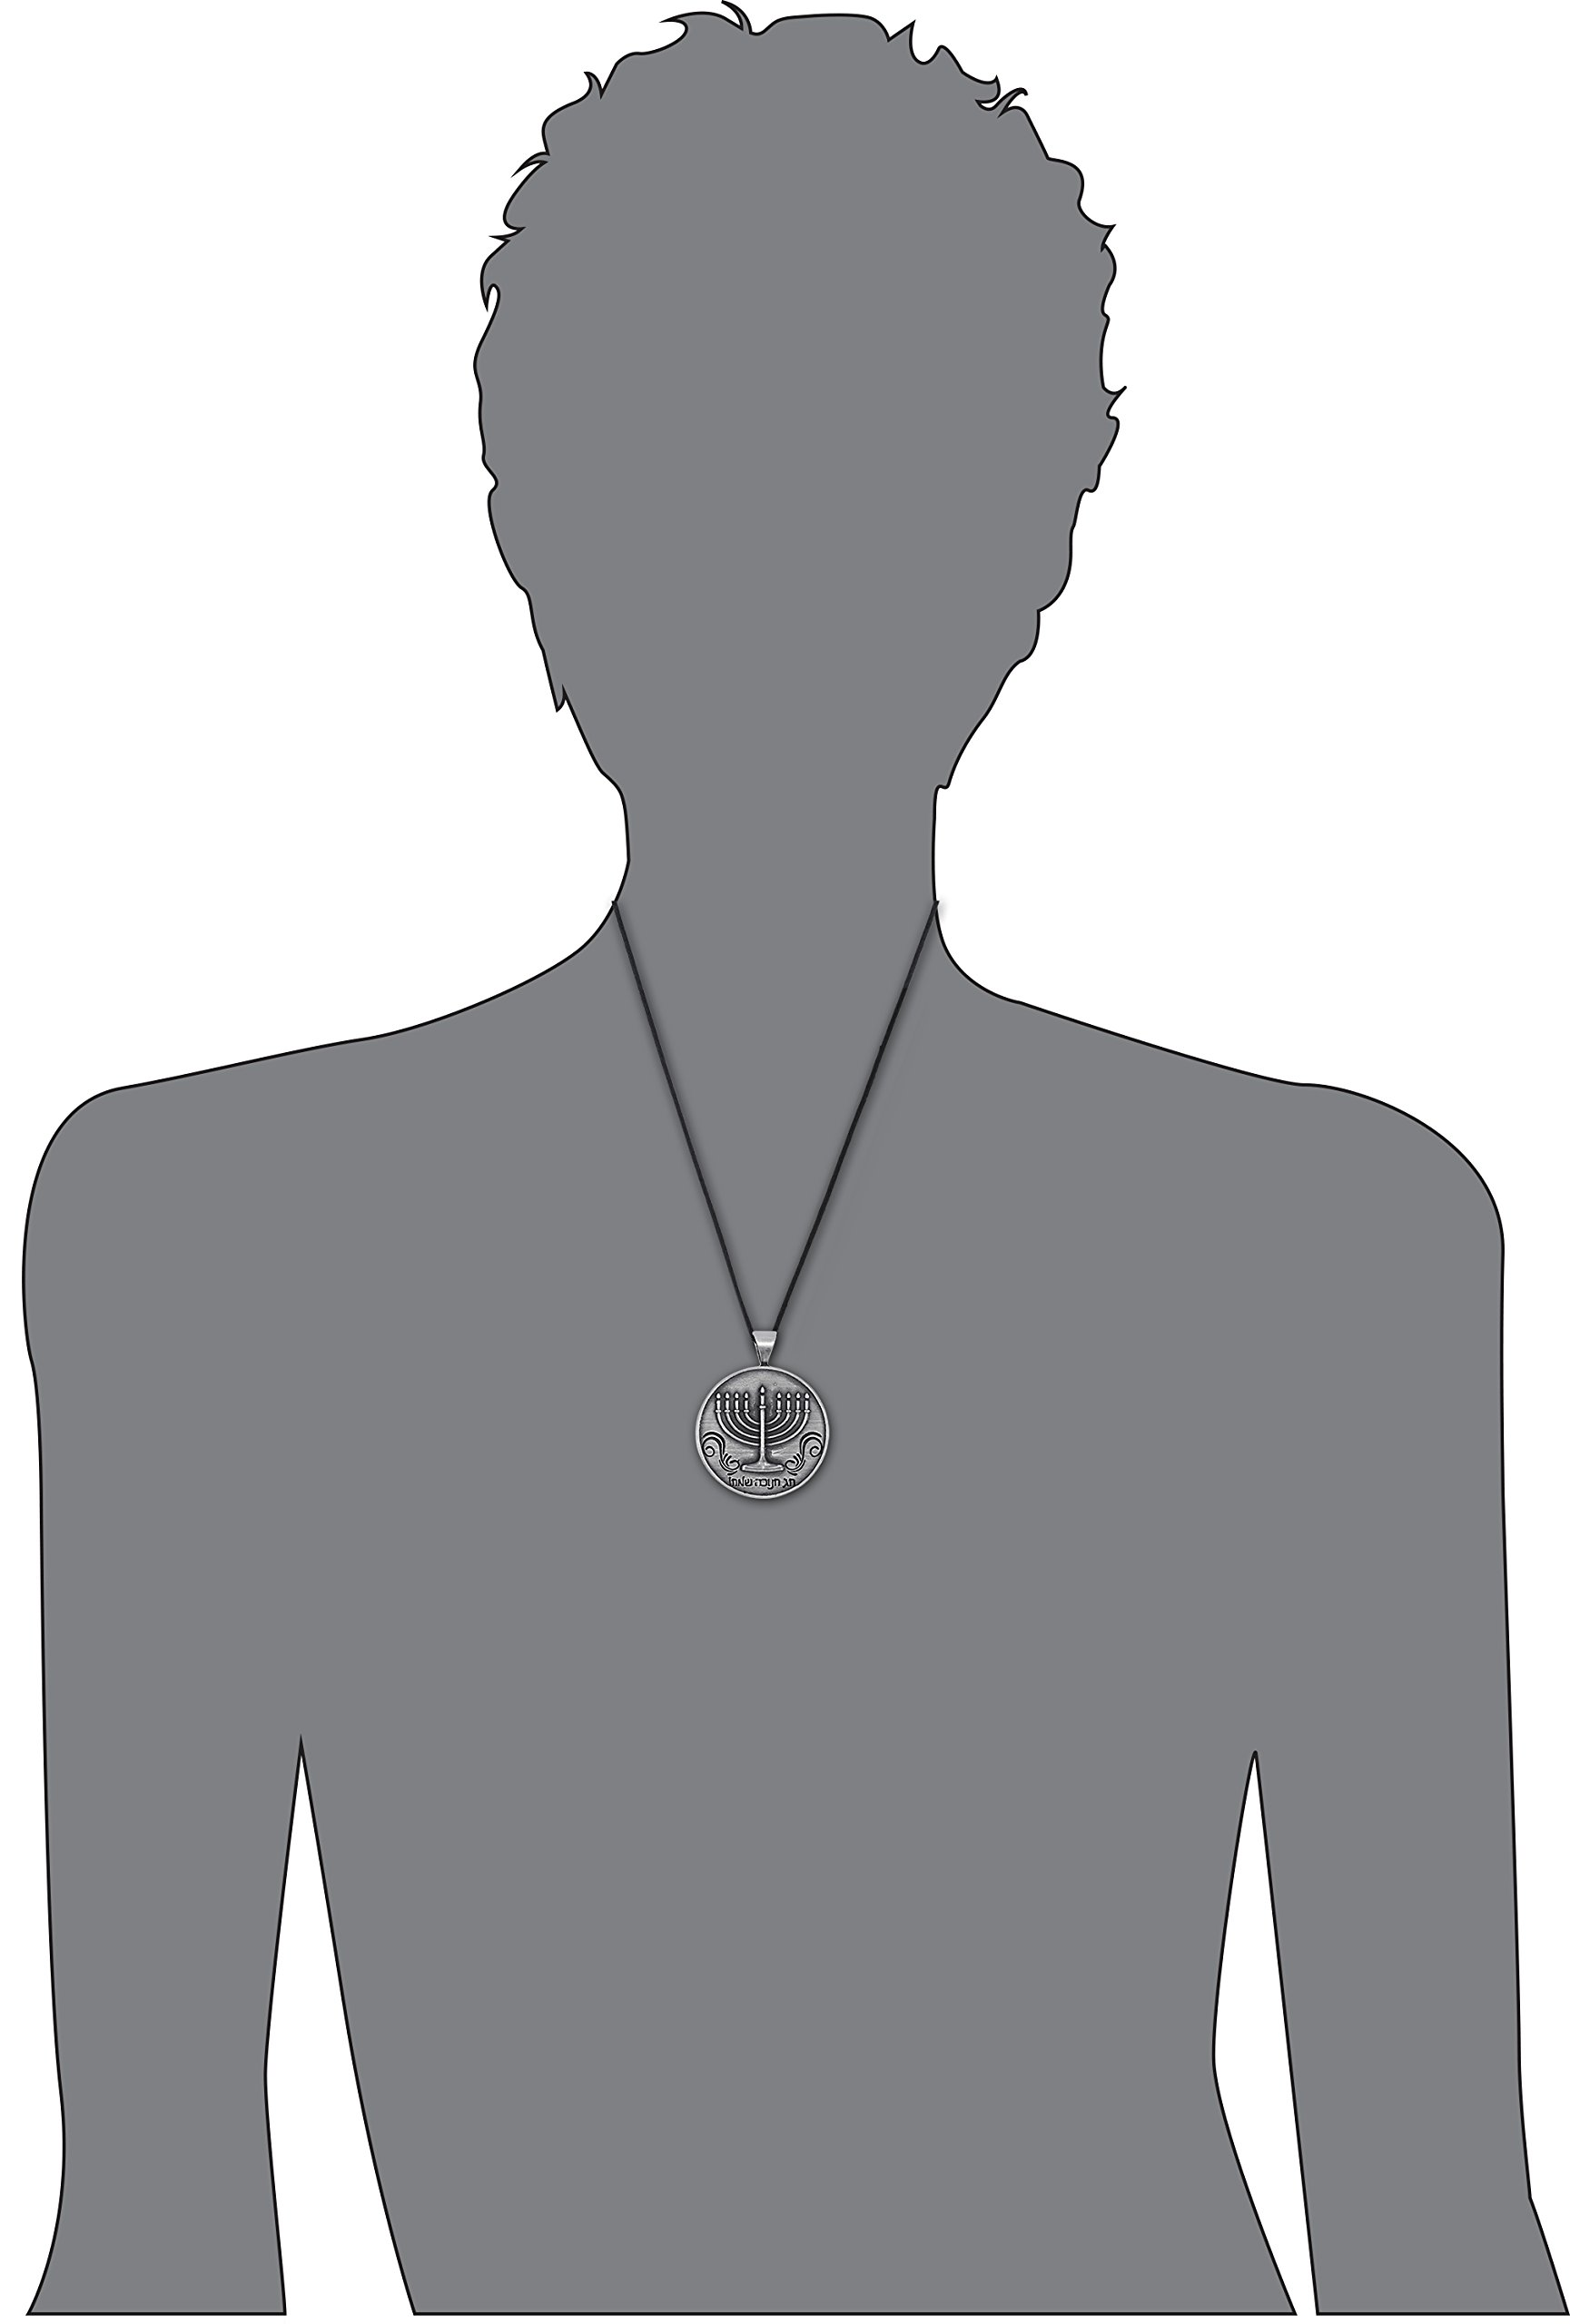 Dan's Jewelers Happy Hanukkah Jewish Menorah Pendant Necklace, Fine Pewter Jewelry by Dan's Jewelers (Image #3)